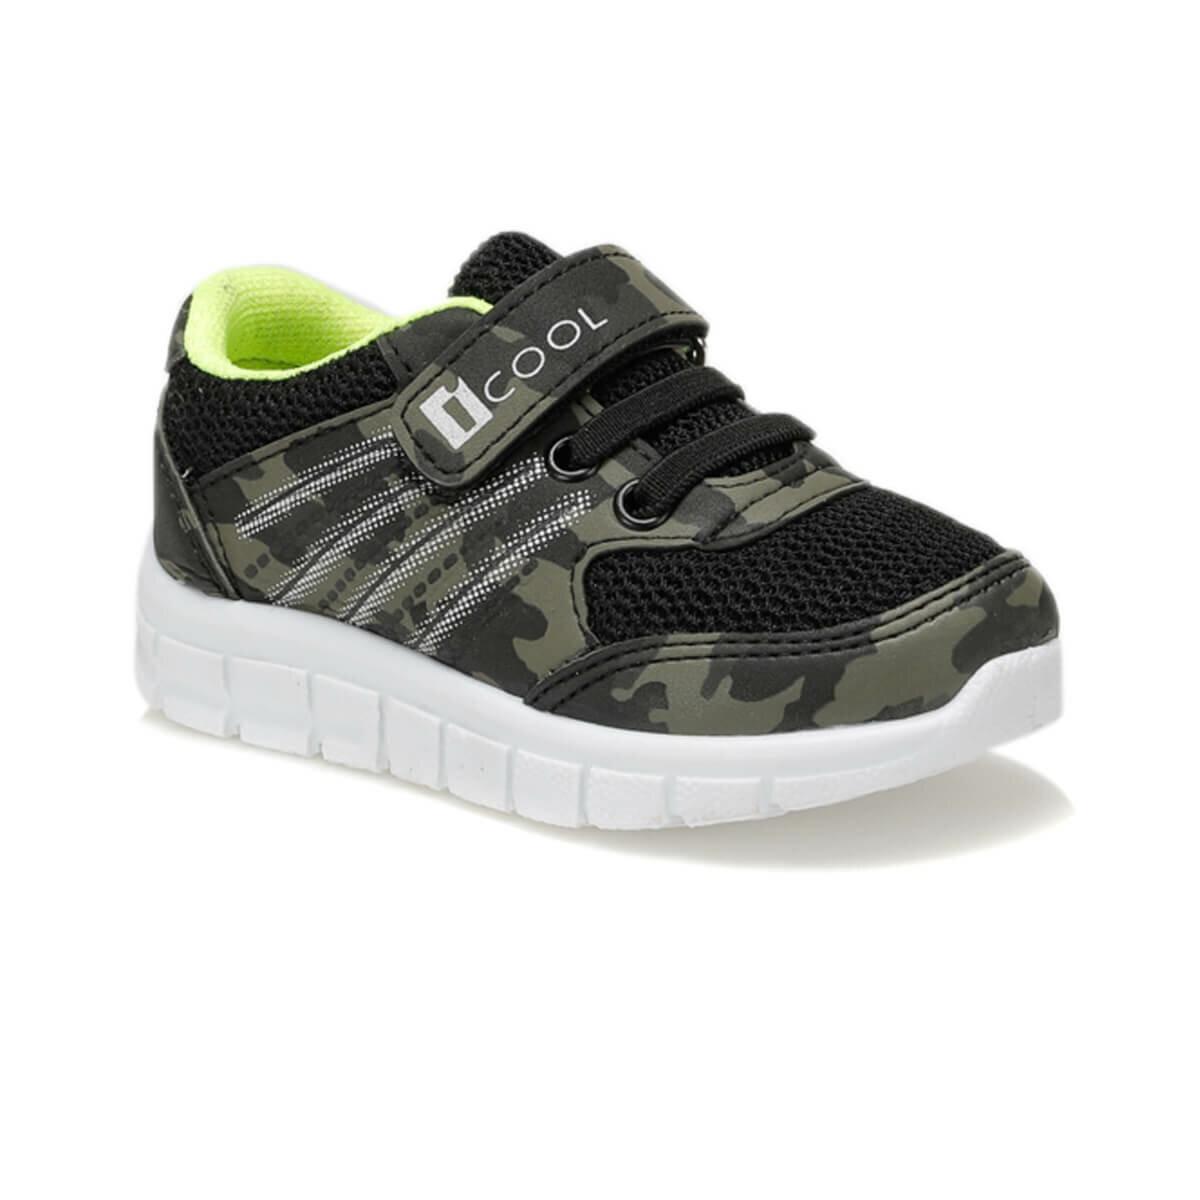 FLO STEFAN Khaki Male Child Sneaker Shoes I-Cool